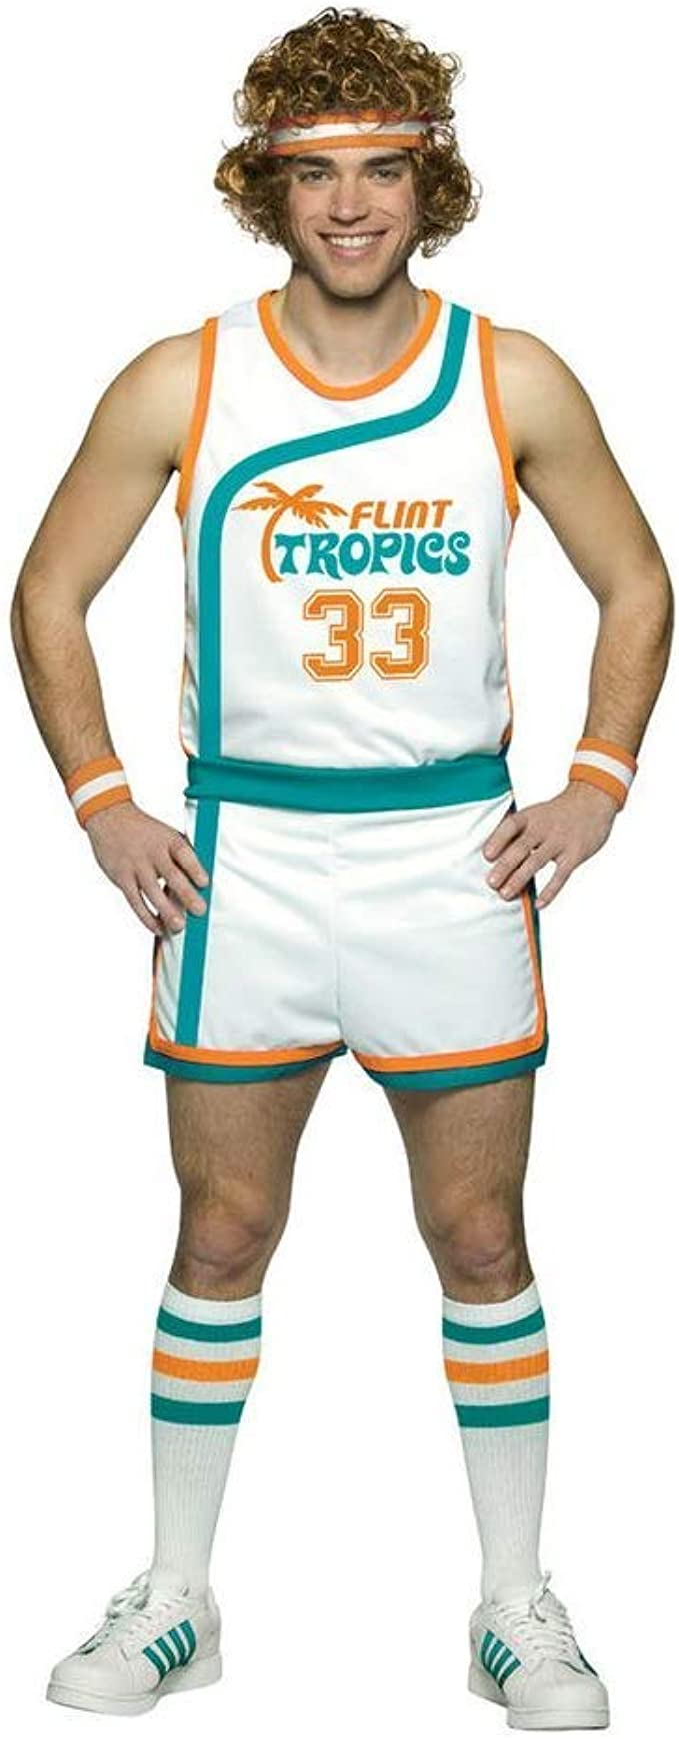 70s Costumes: Disco Costumes, Hippie Outfits Flint Tropics Semi Pro Jackie Moon Basketball Uniform Costume  AT vintagedancer.com